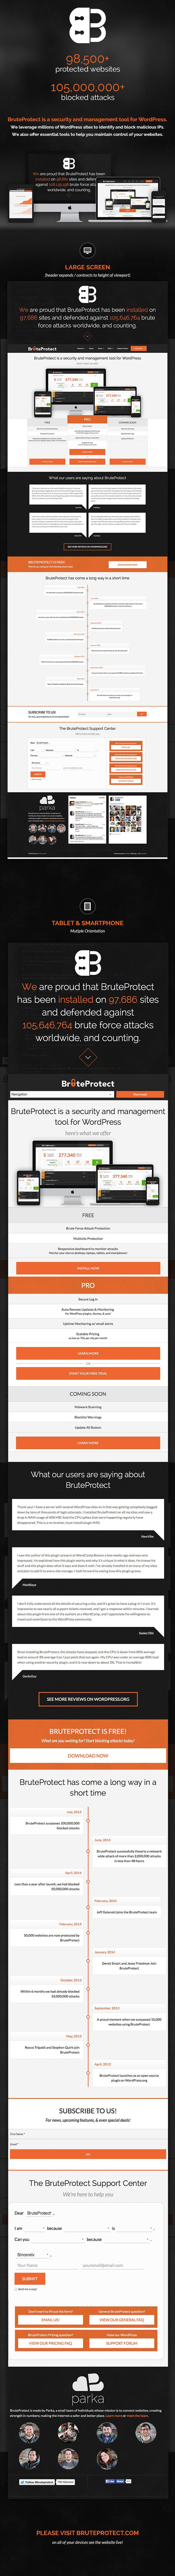 BruteProtect Website 2014 by Parka LLC. #responsive #web #WordPress #security